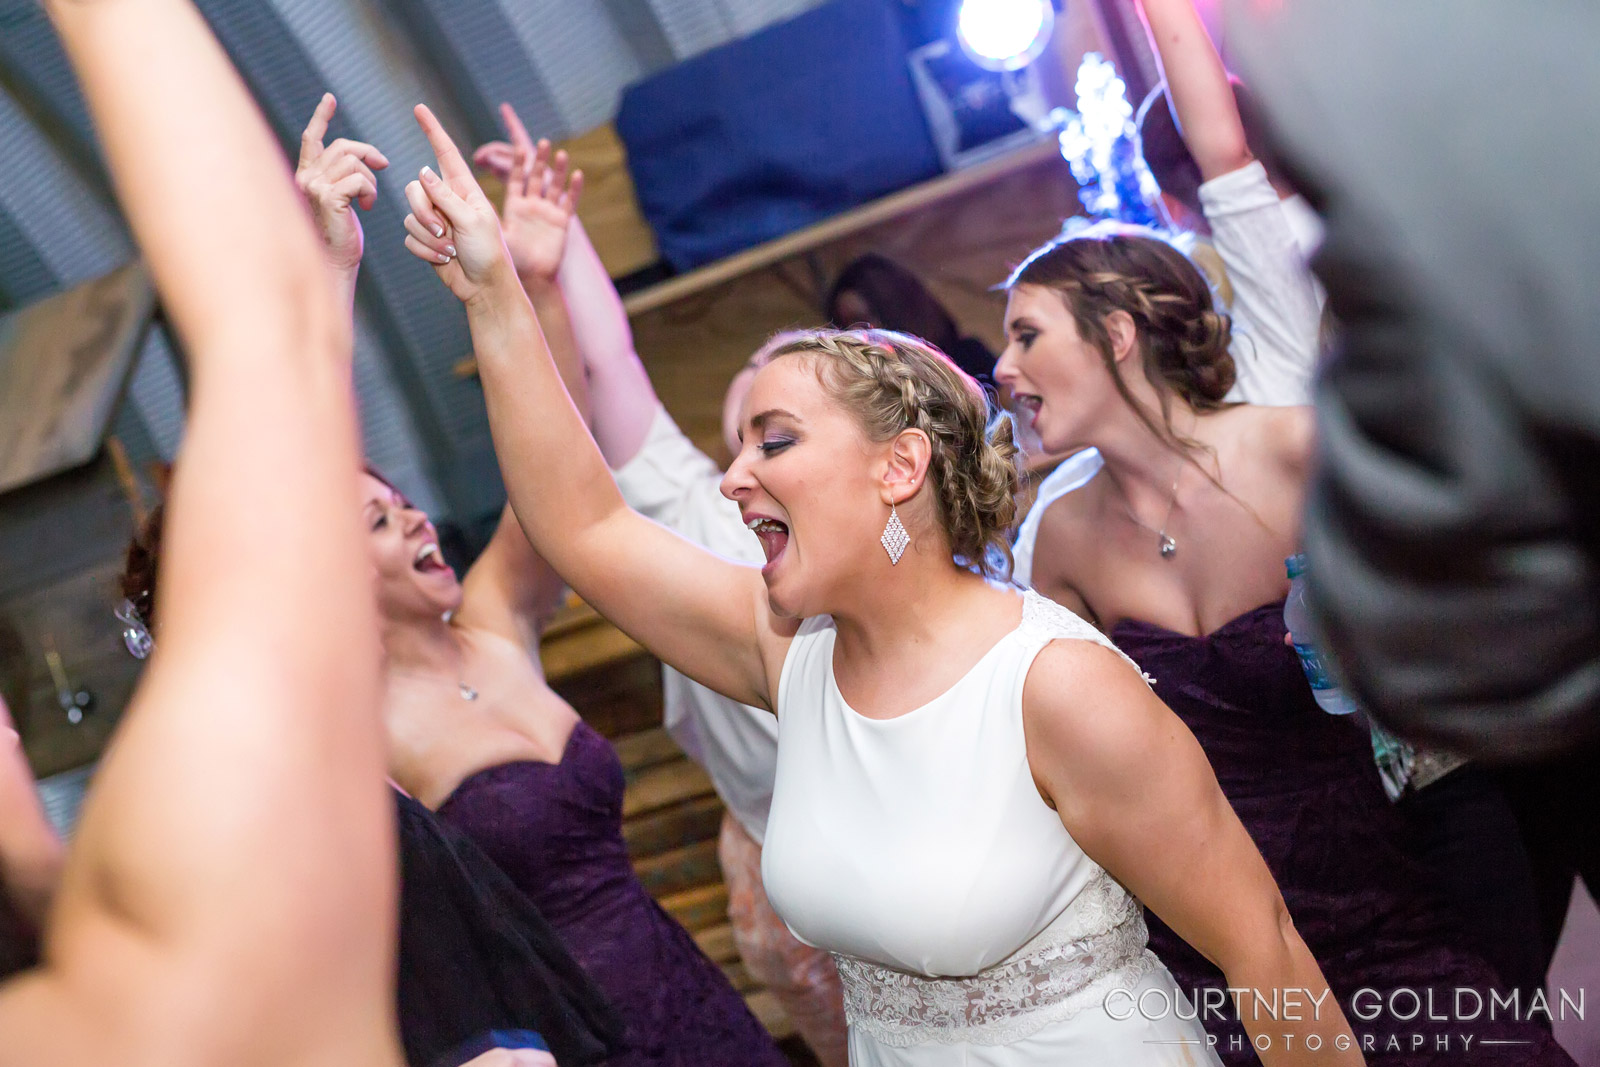 Atlanta-Wedding-Photography-by-Courtney-Goldman-75.jpg